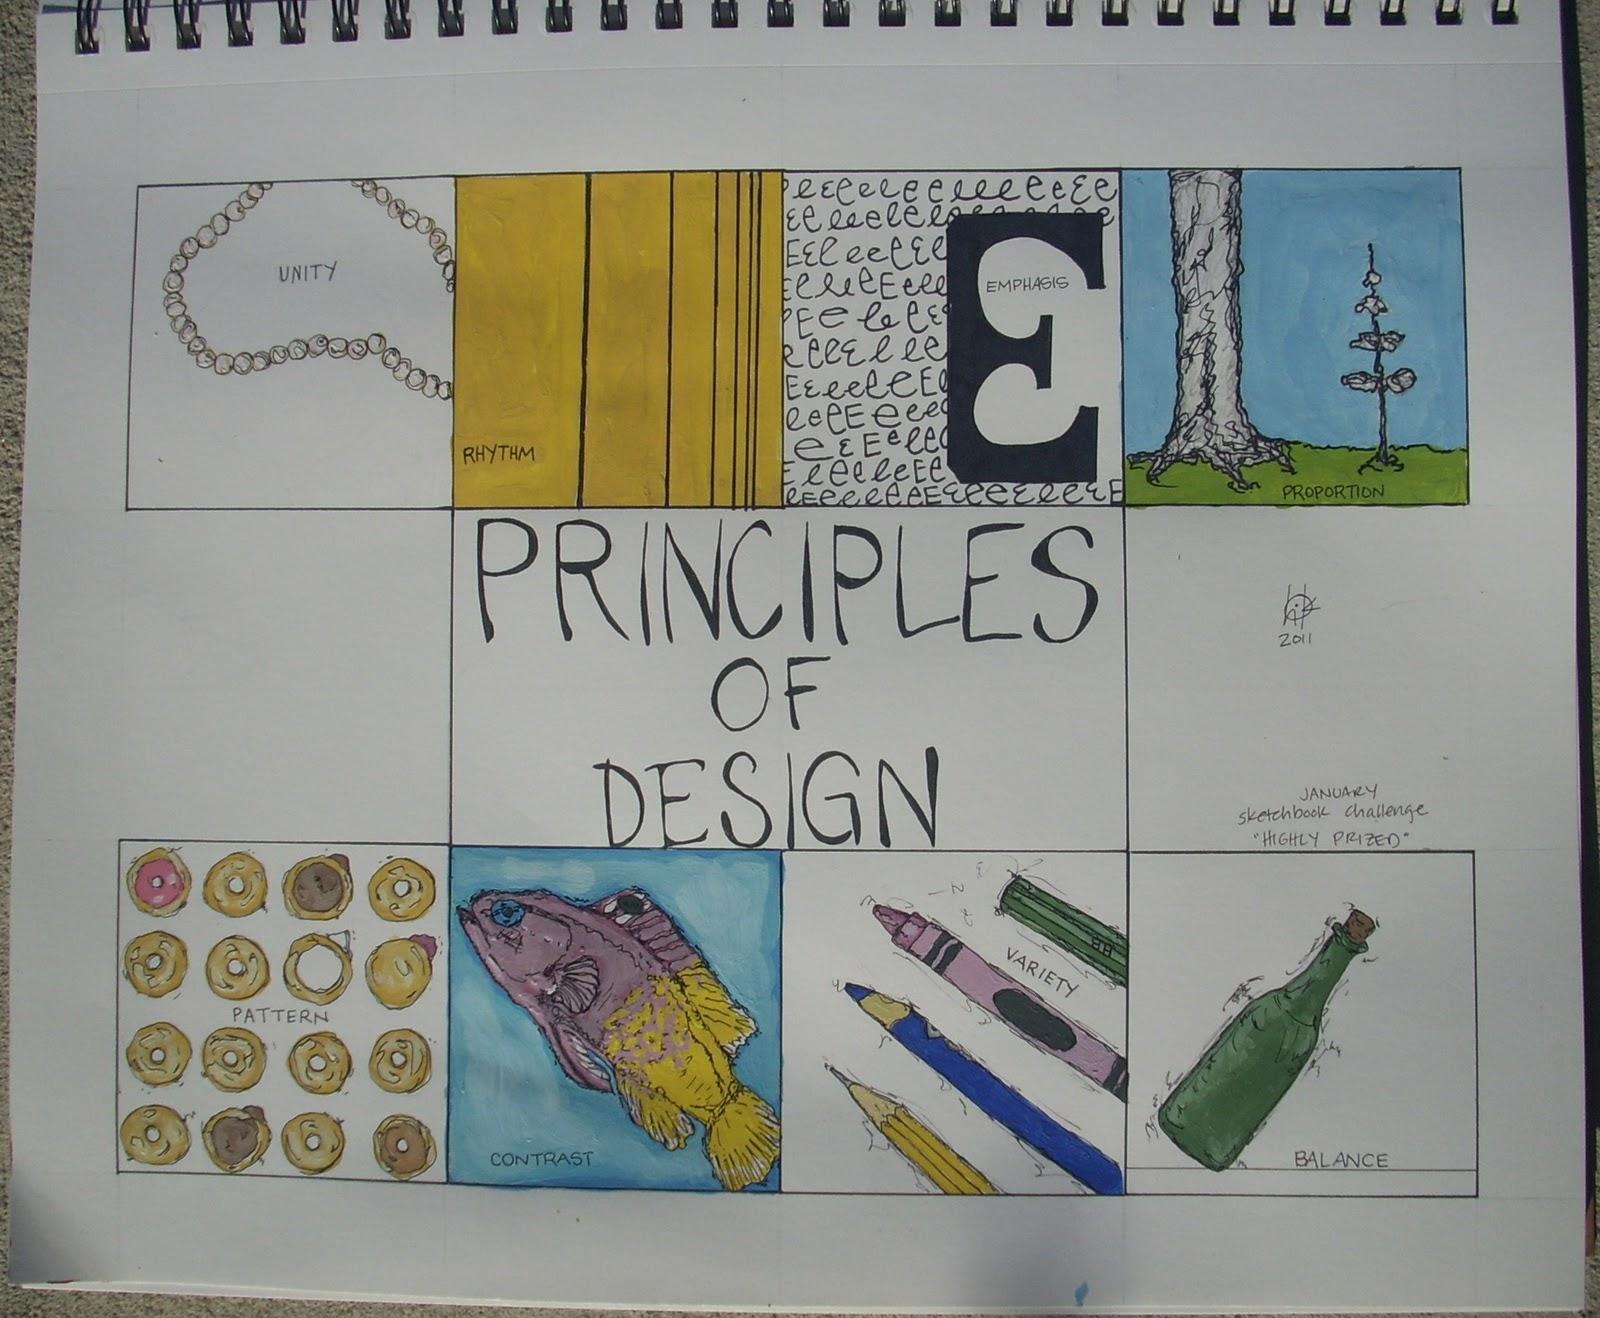 Variety In Principles Of Design : Unity design principle pixshark images